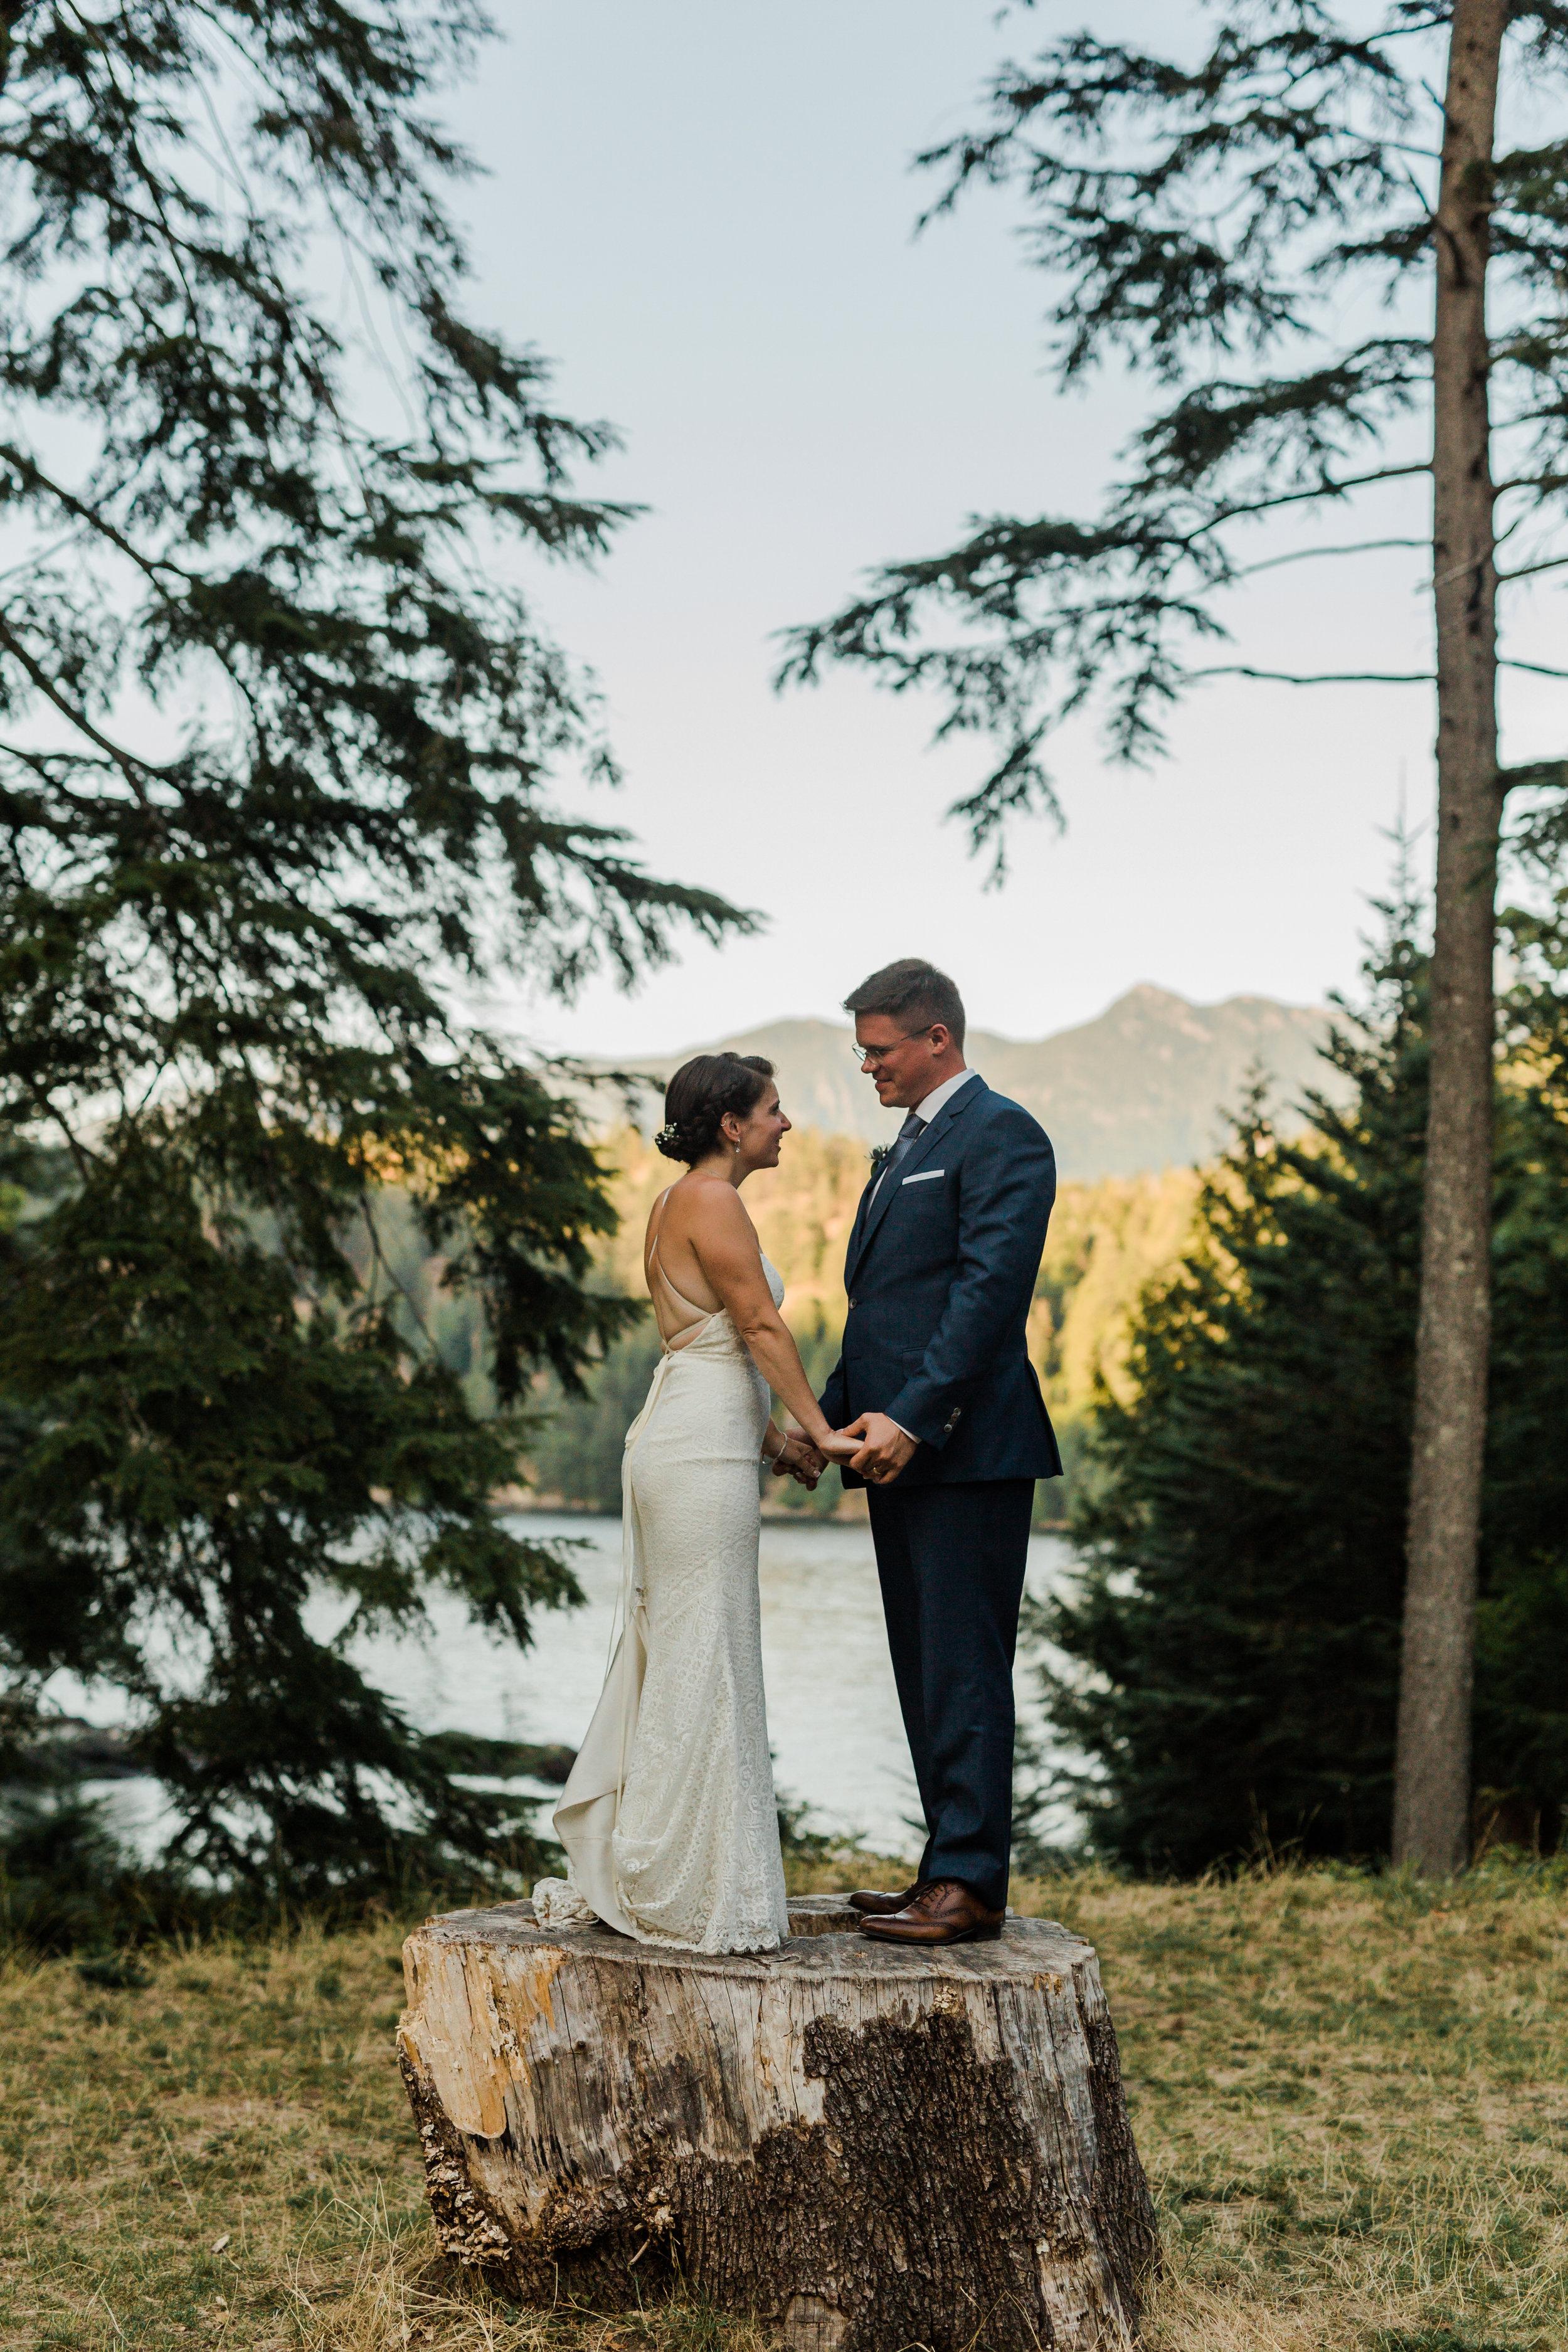 Camp Fircom Wedding - Vancouver Wedding Photographer & Videographer - Sunshine Coast Wedding Photos - Sunshine Coast Wedding Photographer - Jennifer Picard Photography - IMG_1025.jpg